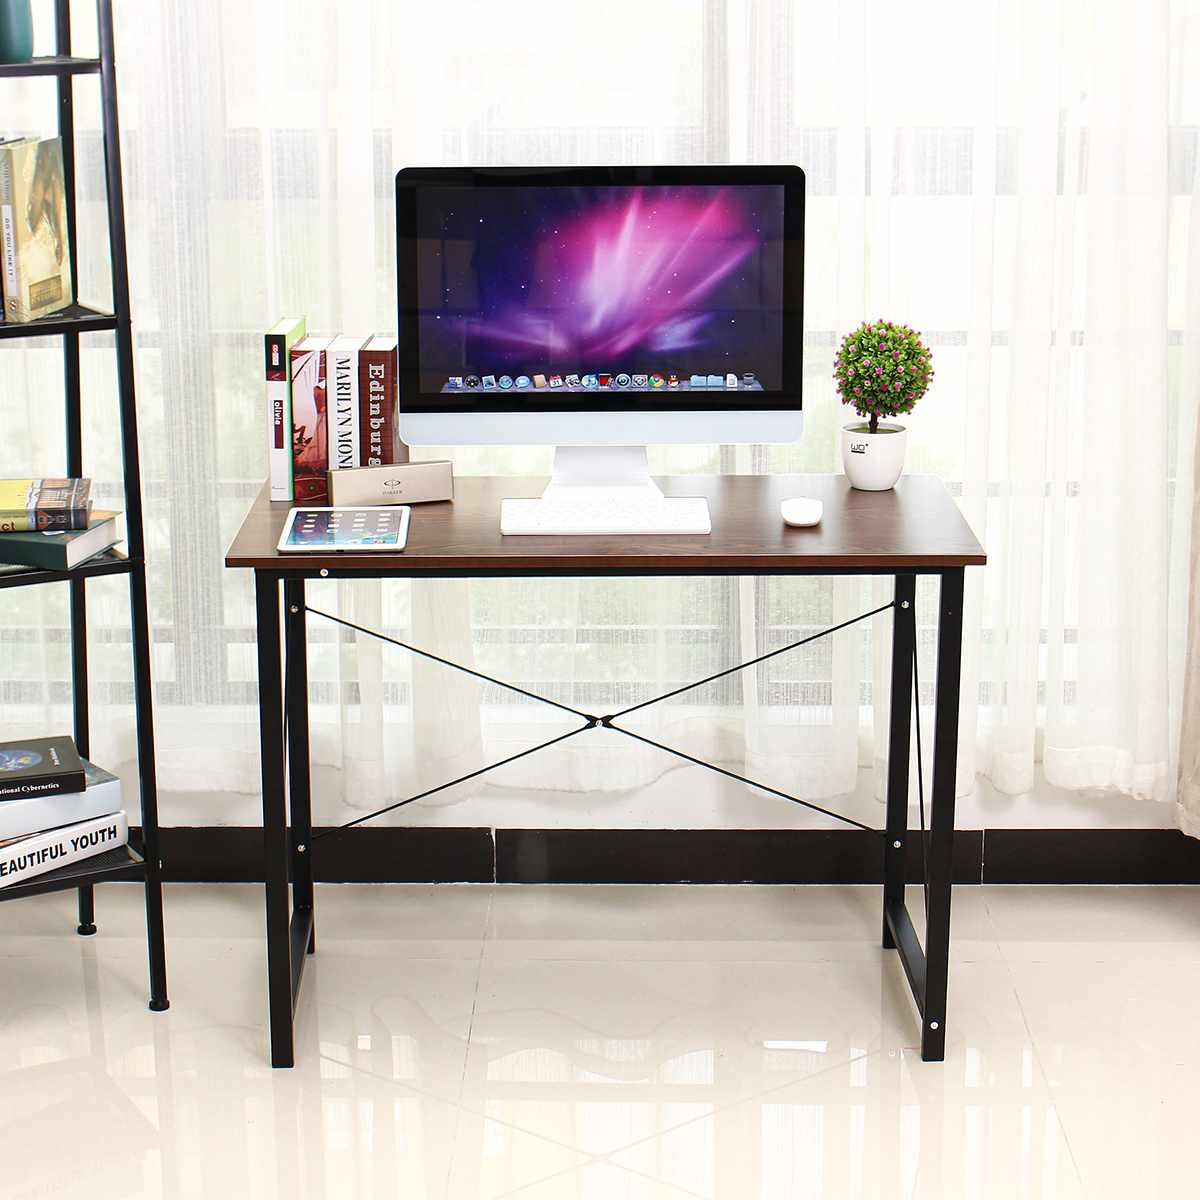 Wood Laptop Desk Laptop Bed Table Standing Desk Laptop Stand Mesa Study Table Laptop Table Computer Desk Computer Table